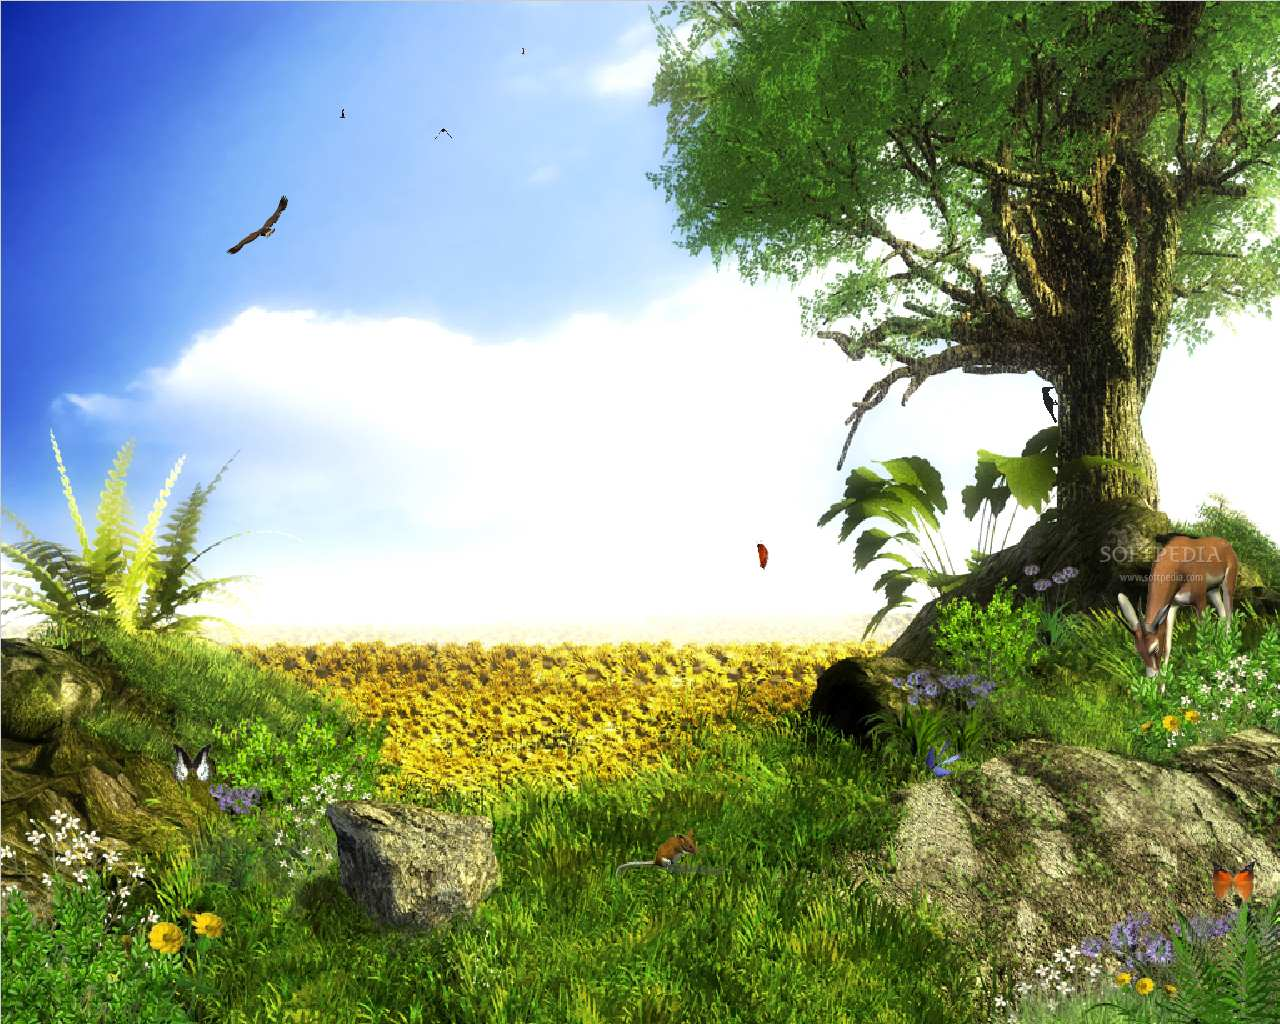 http://4.bp.blogspot.com/-TcDymEhNXFM/Ta_eCE7QeXI/AAAAAAAAAKI/gtuquUnwv9w/s1600/Sunflowers-Animated-Wallpaper_1.jpg